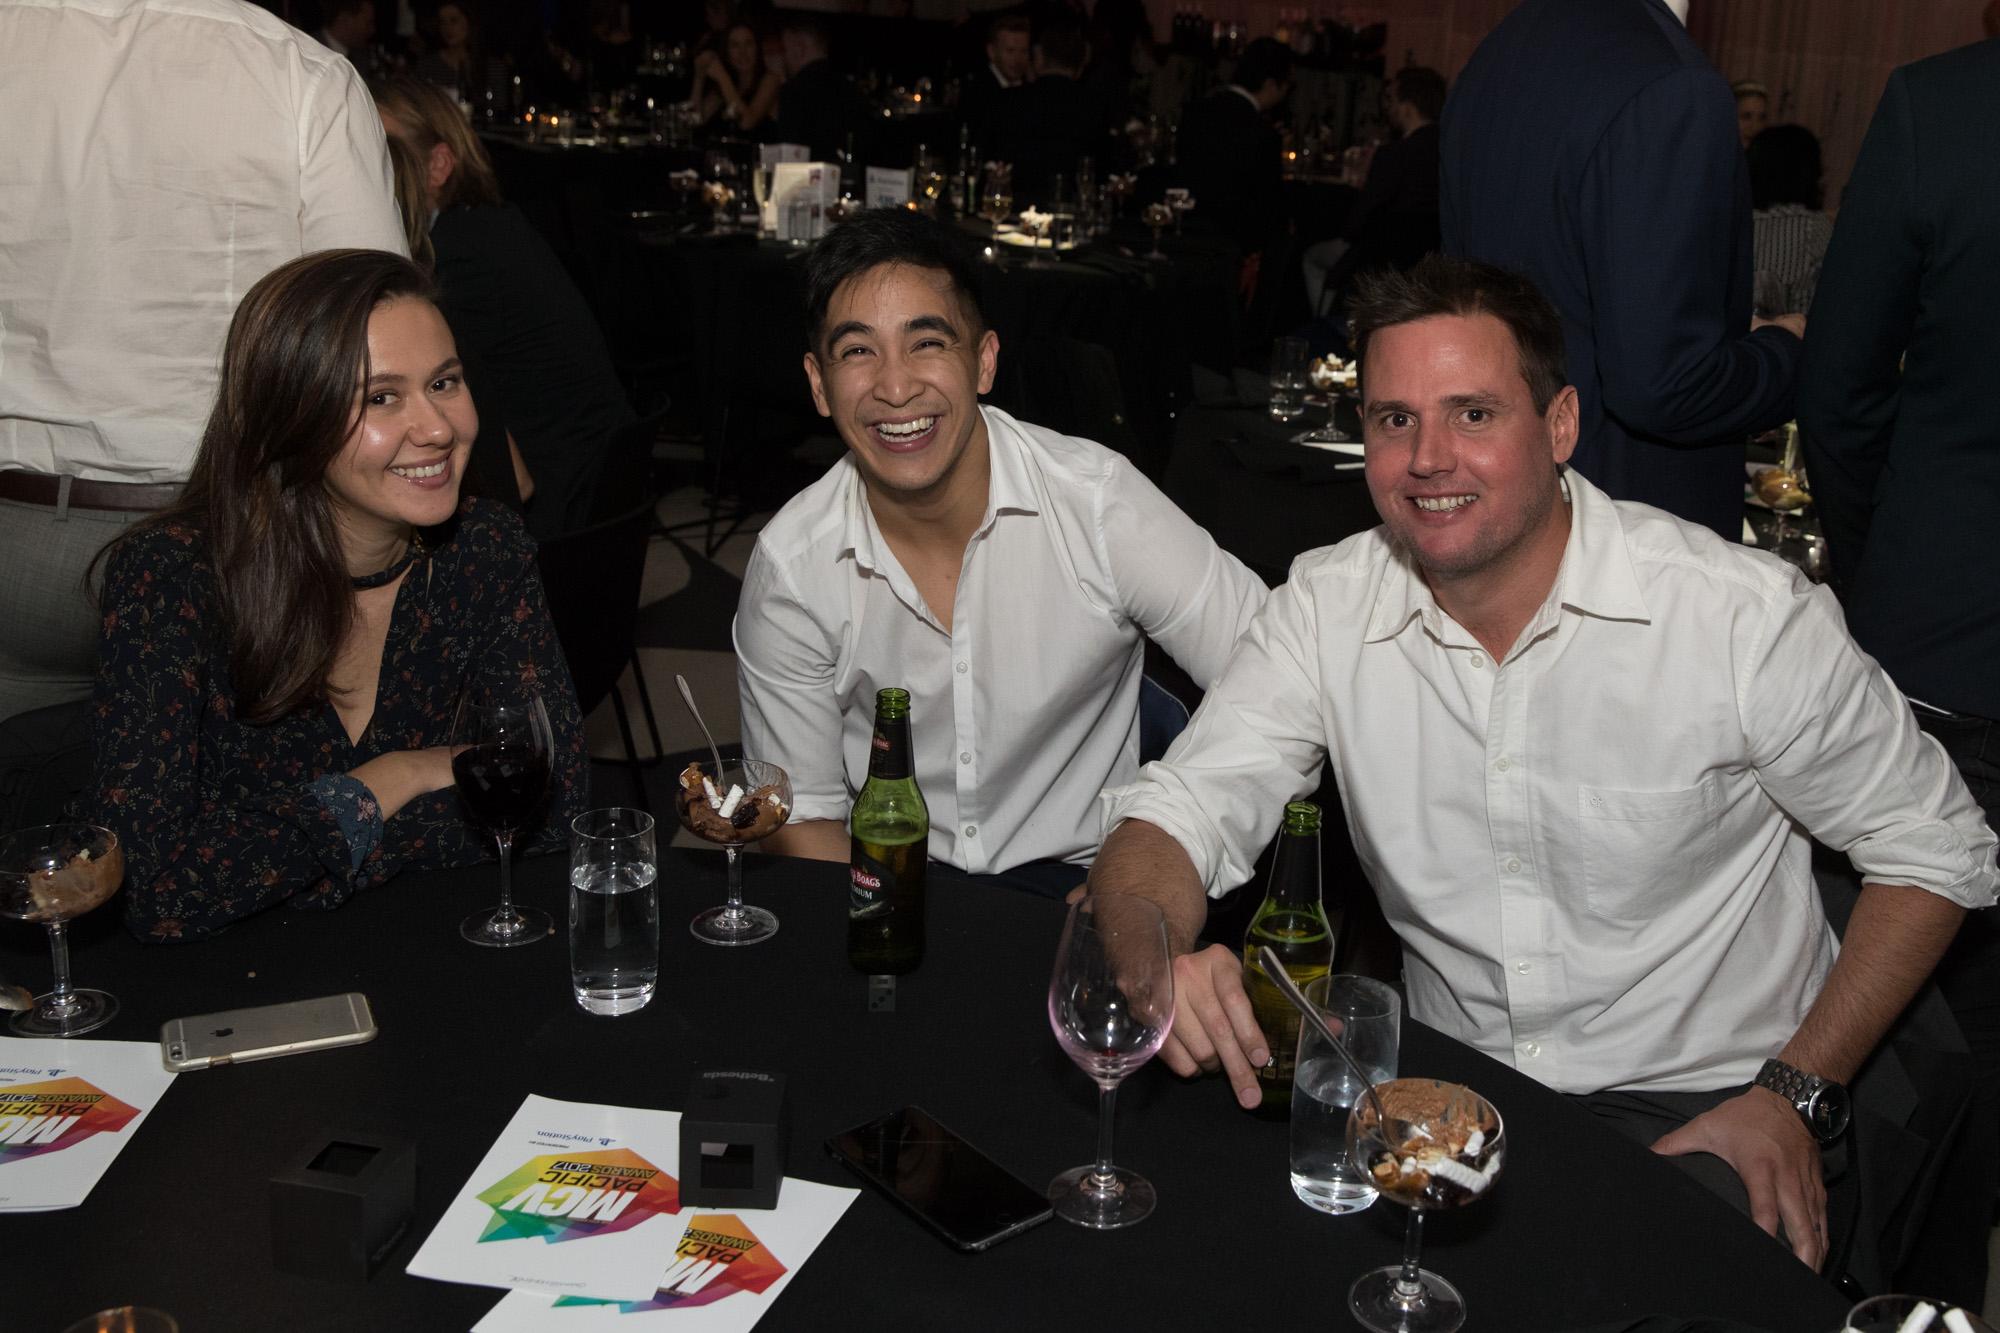 MCV_Pacific_Awards_1_June_17_PS_165.jpg